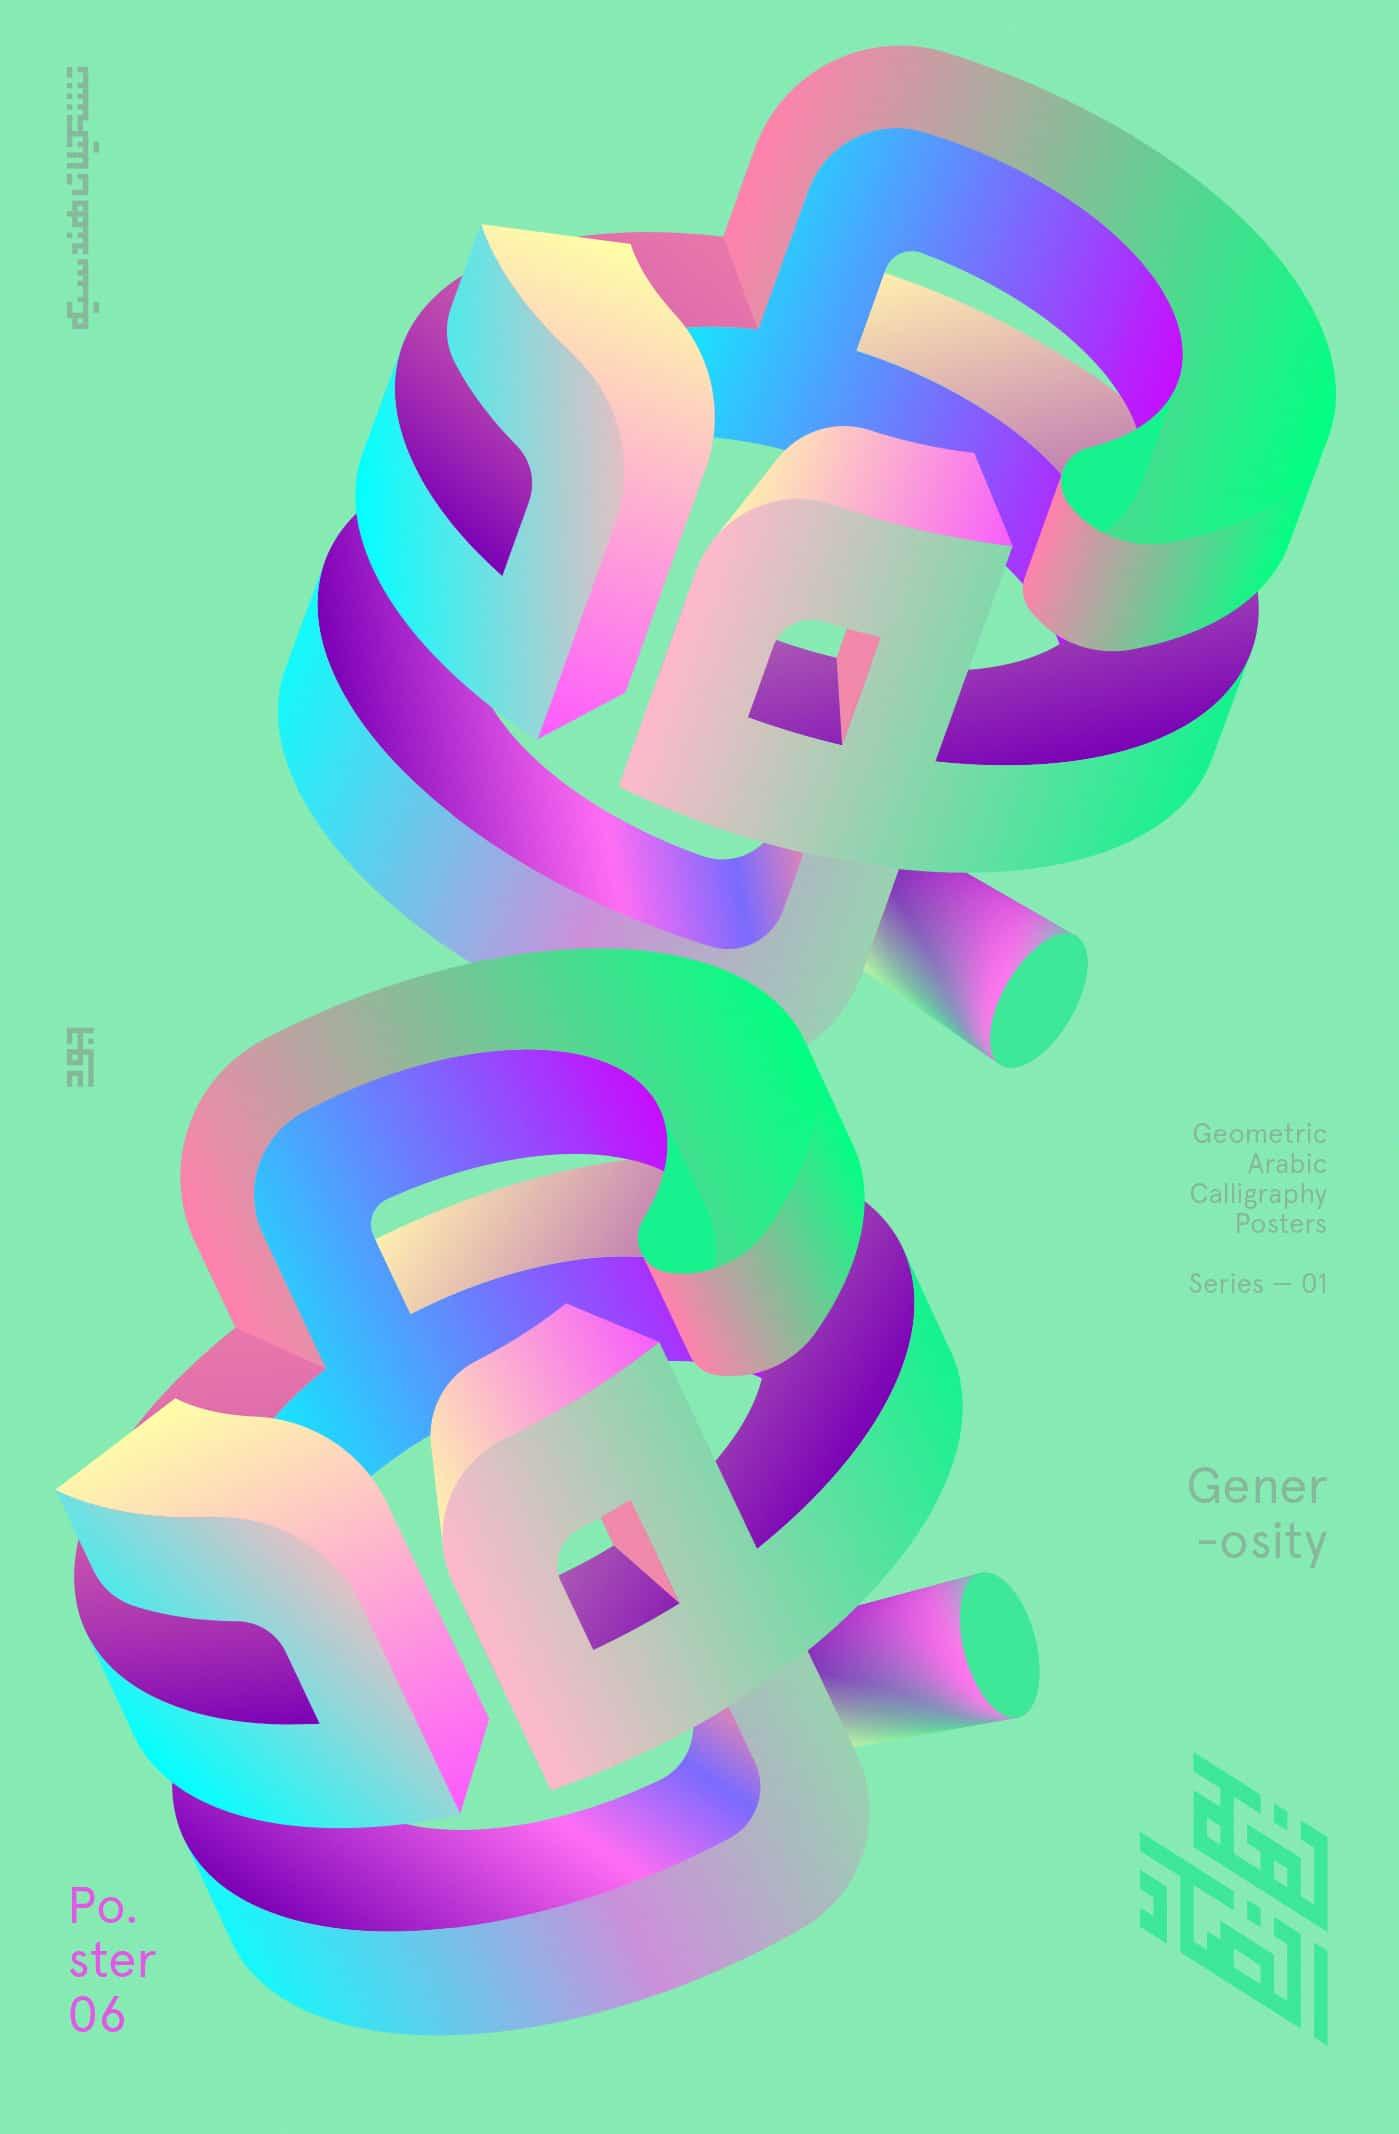 Graphic Design | Typosters – Mohamed Samir